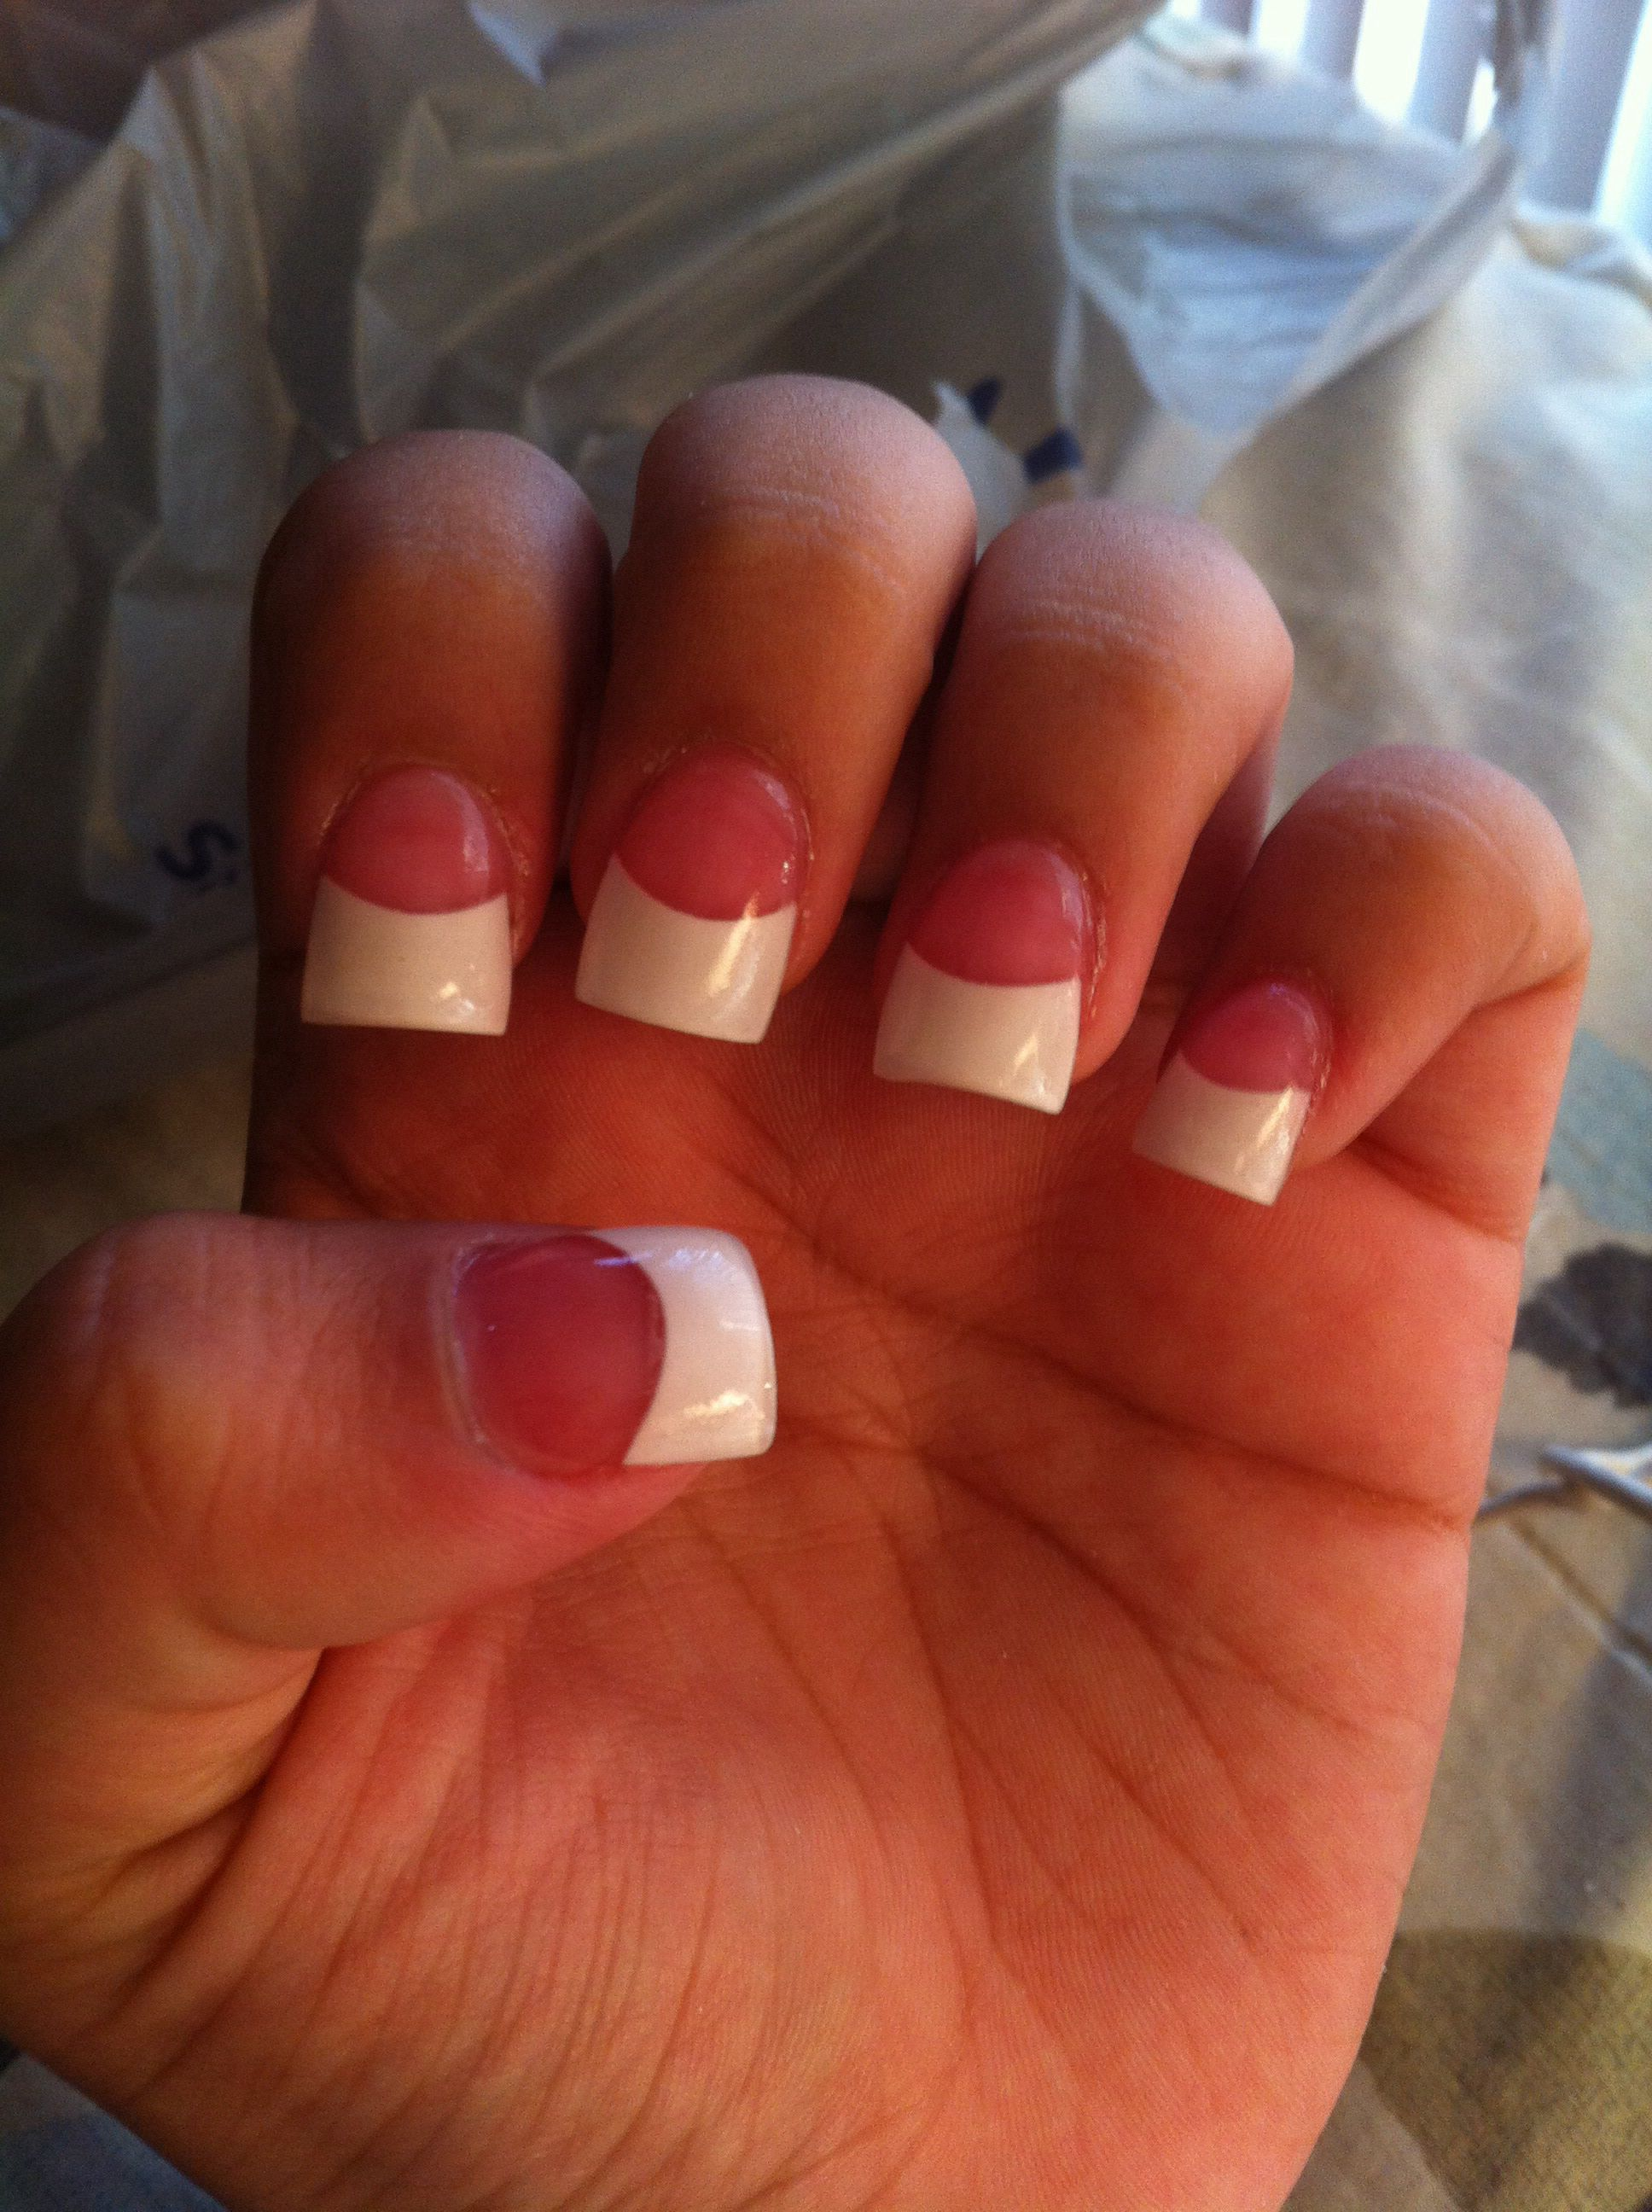 Pink And White Full Set Love Pinkandwhite Fullset Acrylics Nails French Manicure Summernail French Manicure Acrylic Nails Short Acrylic Nails Manicure